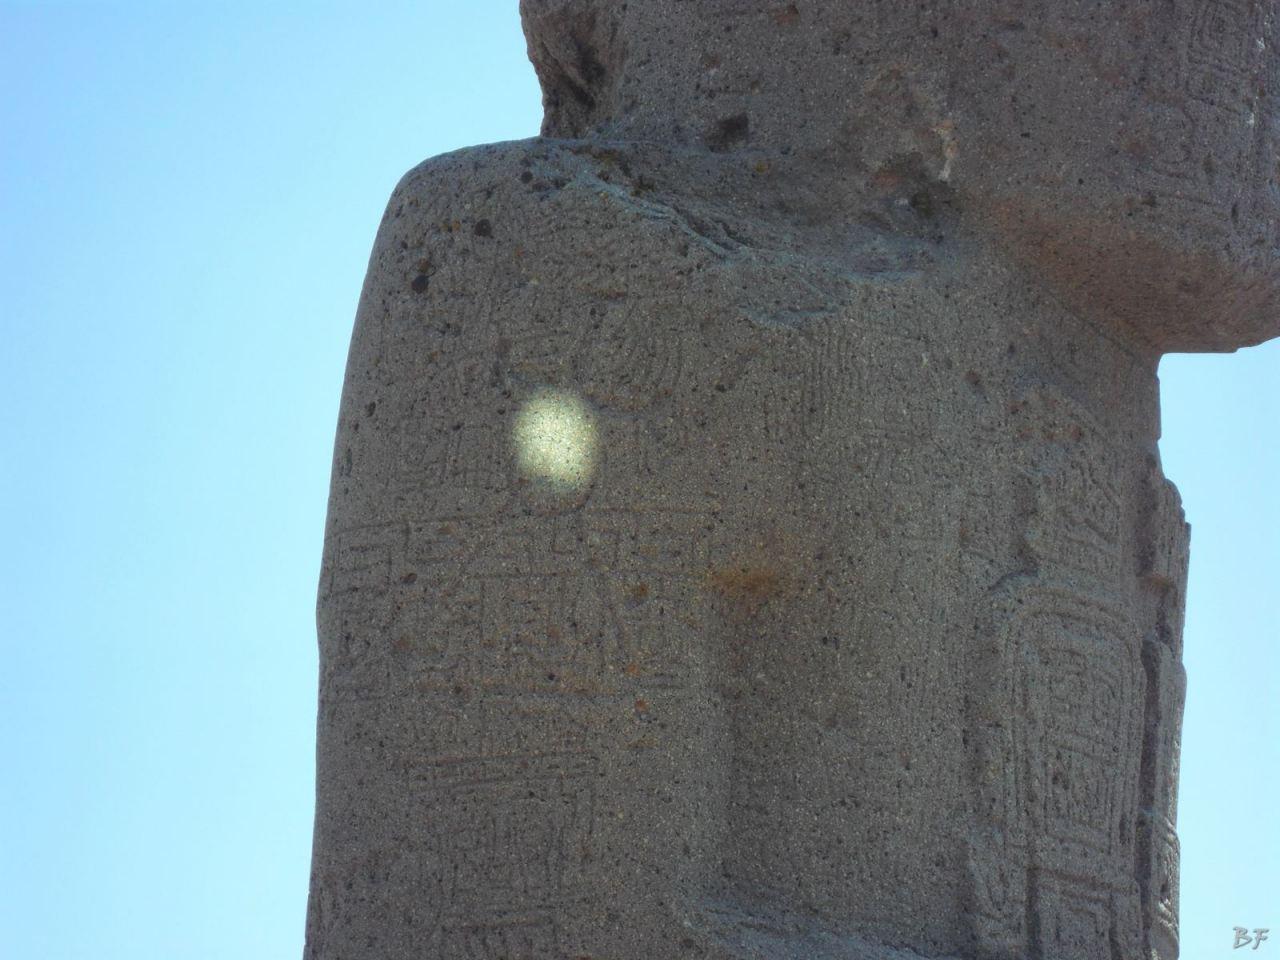 Sito-Megalitico-Piramide-Akapana-Kalasasaya-Menhir-Tiahuanaco-Bolivia-40